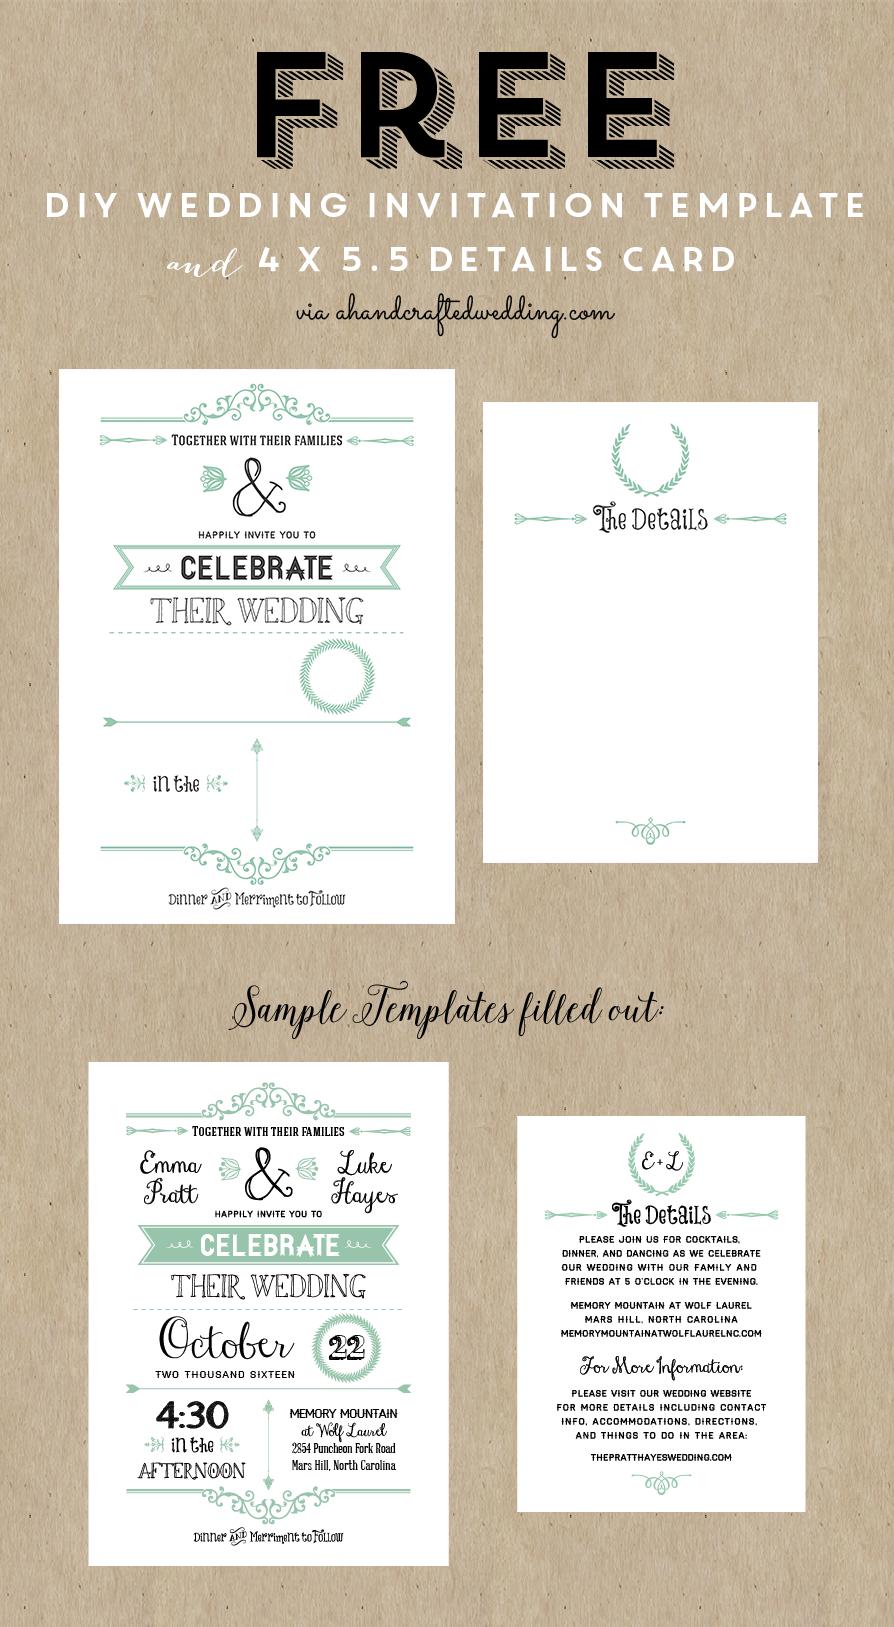 Free Printable Wedding Invitation Template   Wedding   Free Wedding - Free Printable Wedding Cards